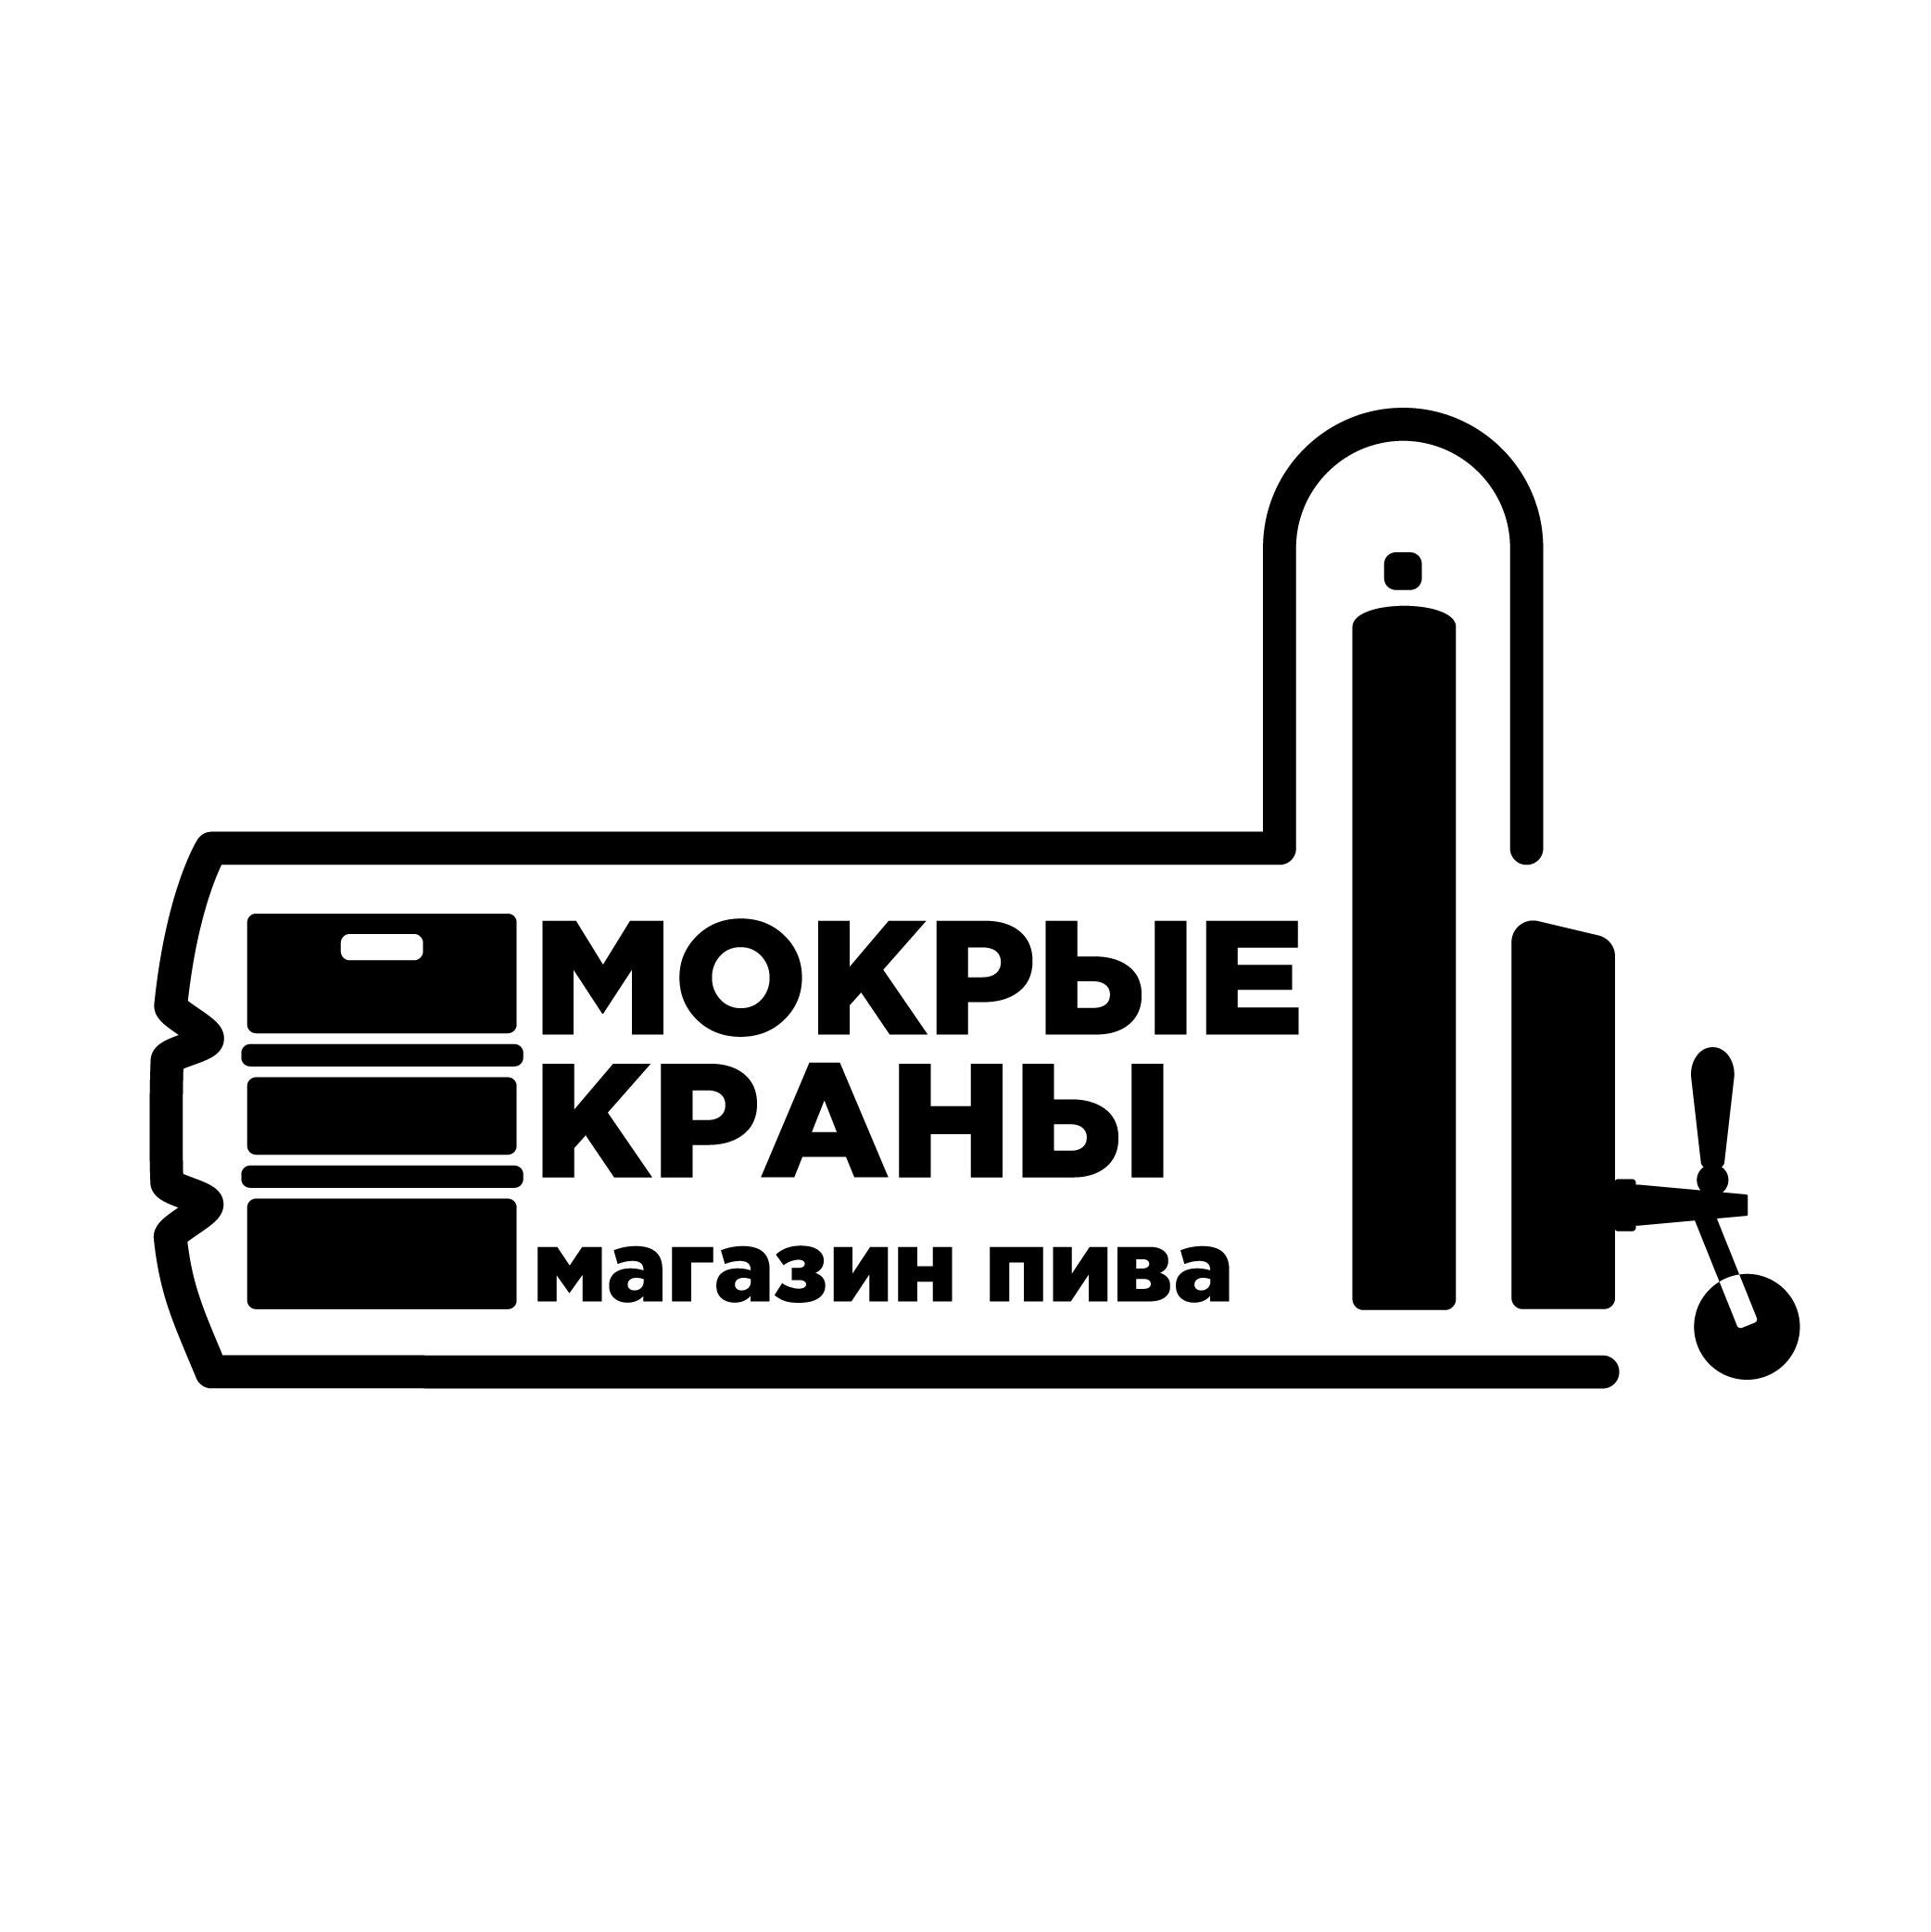 Вывеска/логотип для пивного магазина фото f_504602b3ae6e0d28.jpg